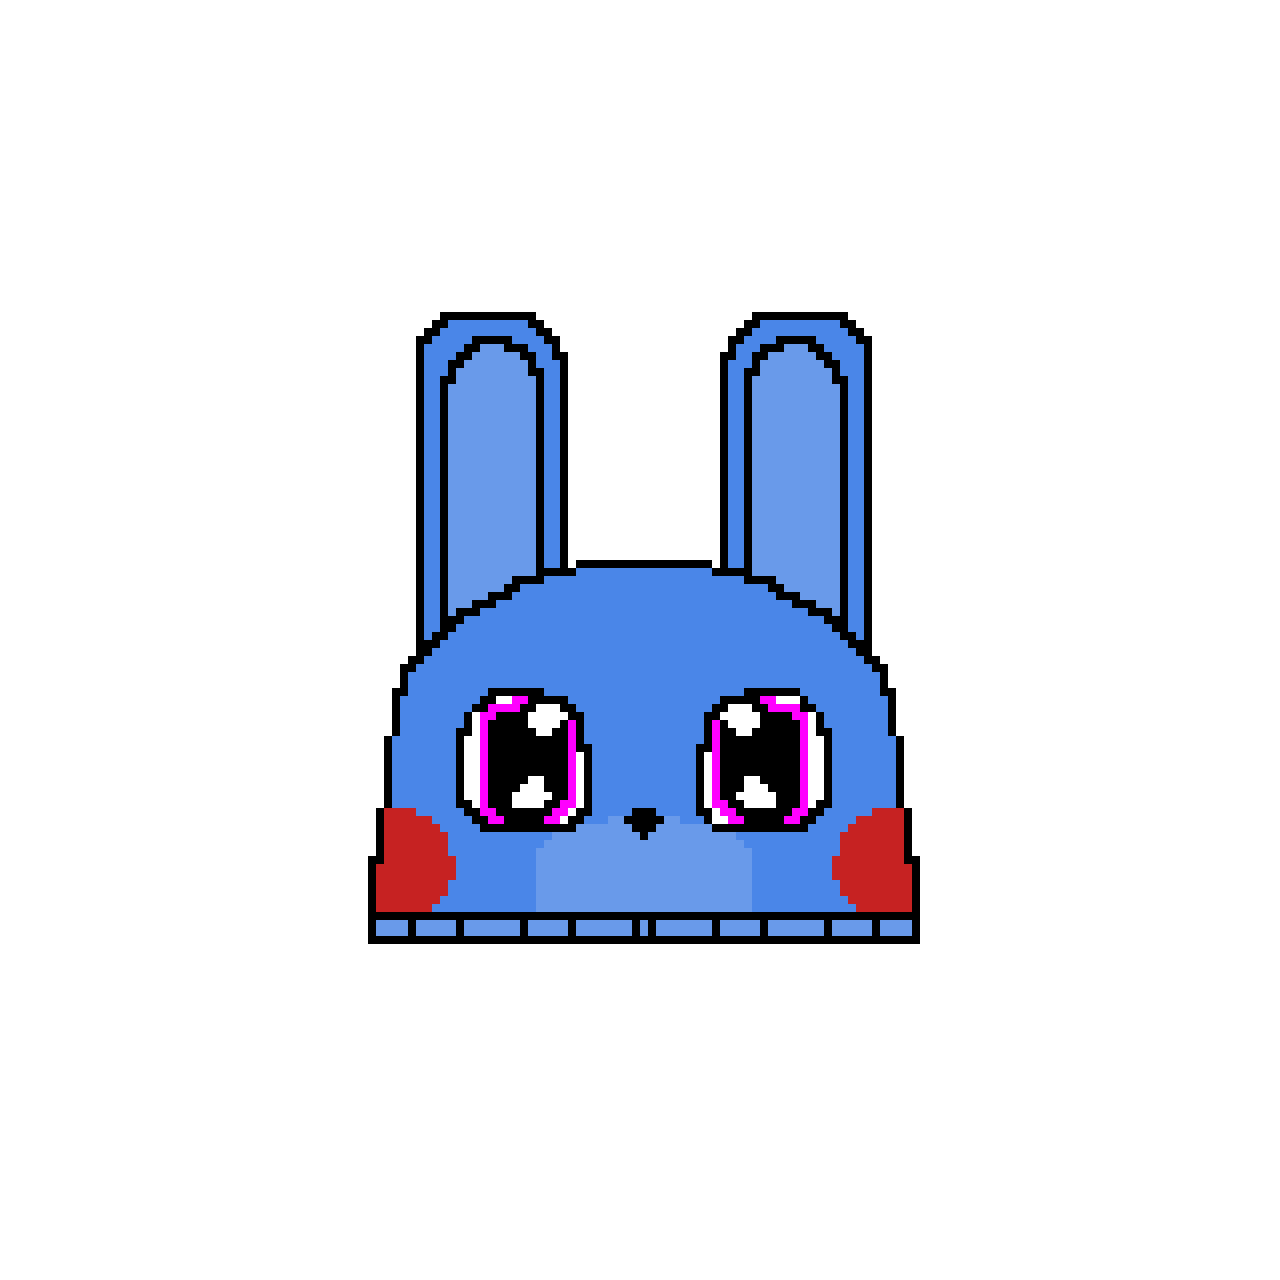 Bon Bon The Bunny Slipper (If This Gets Ten Likes I'll Draw Bonnie The Bunny Slipper)